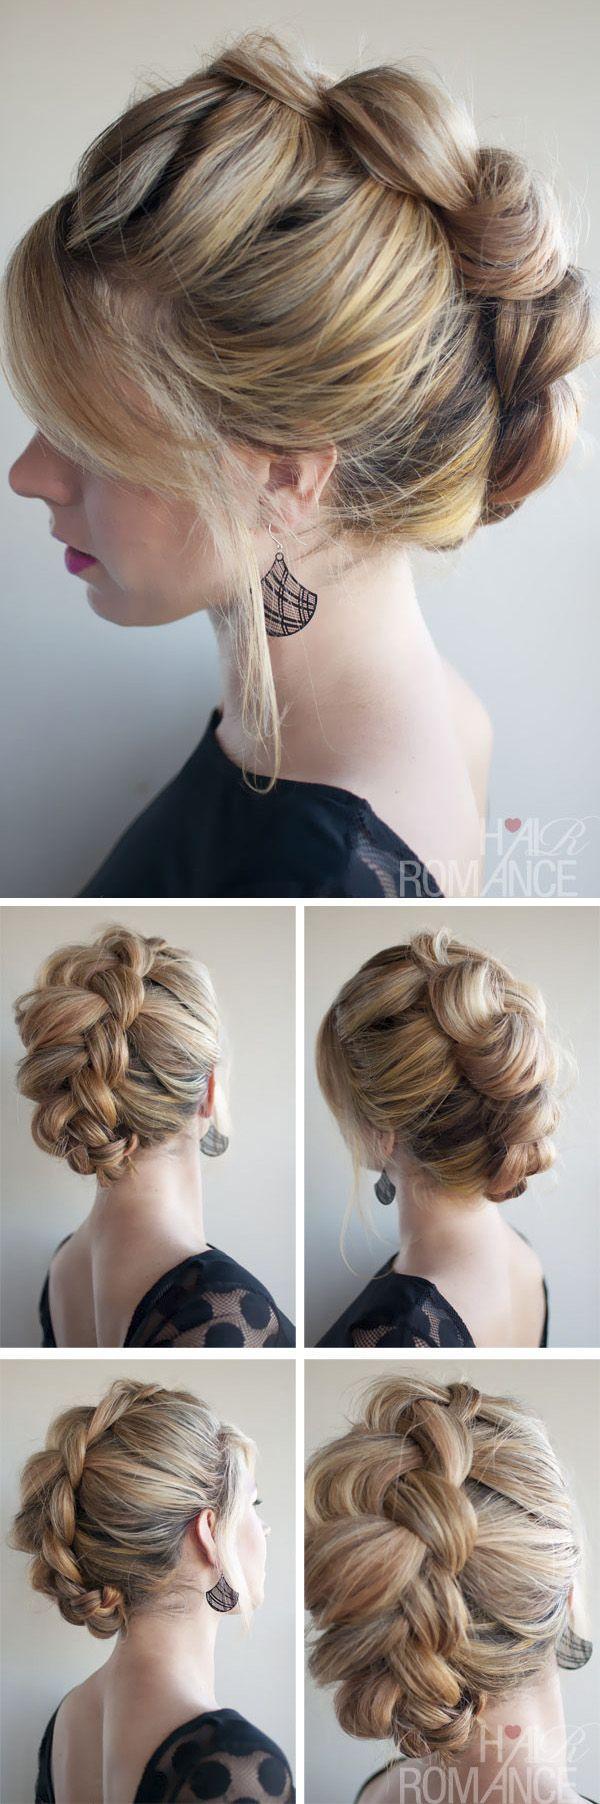 Very chic braid diy diy hair style hair u beauty pinterest